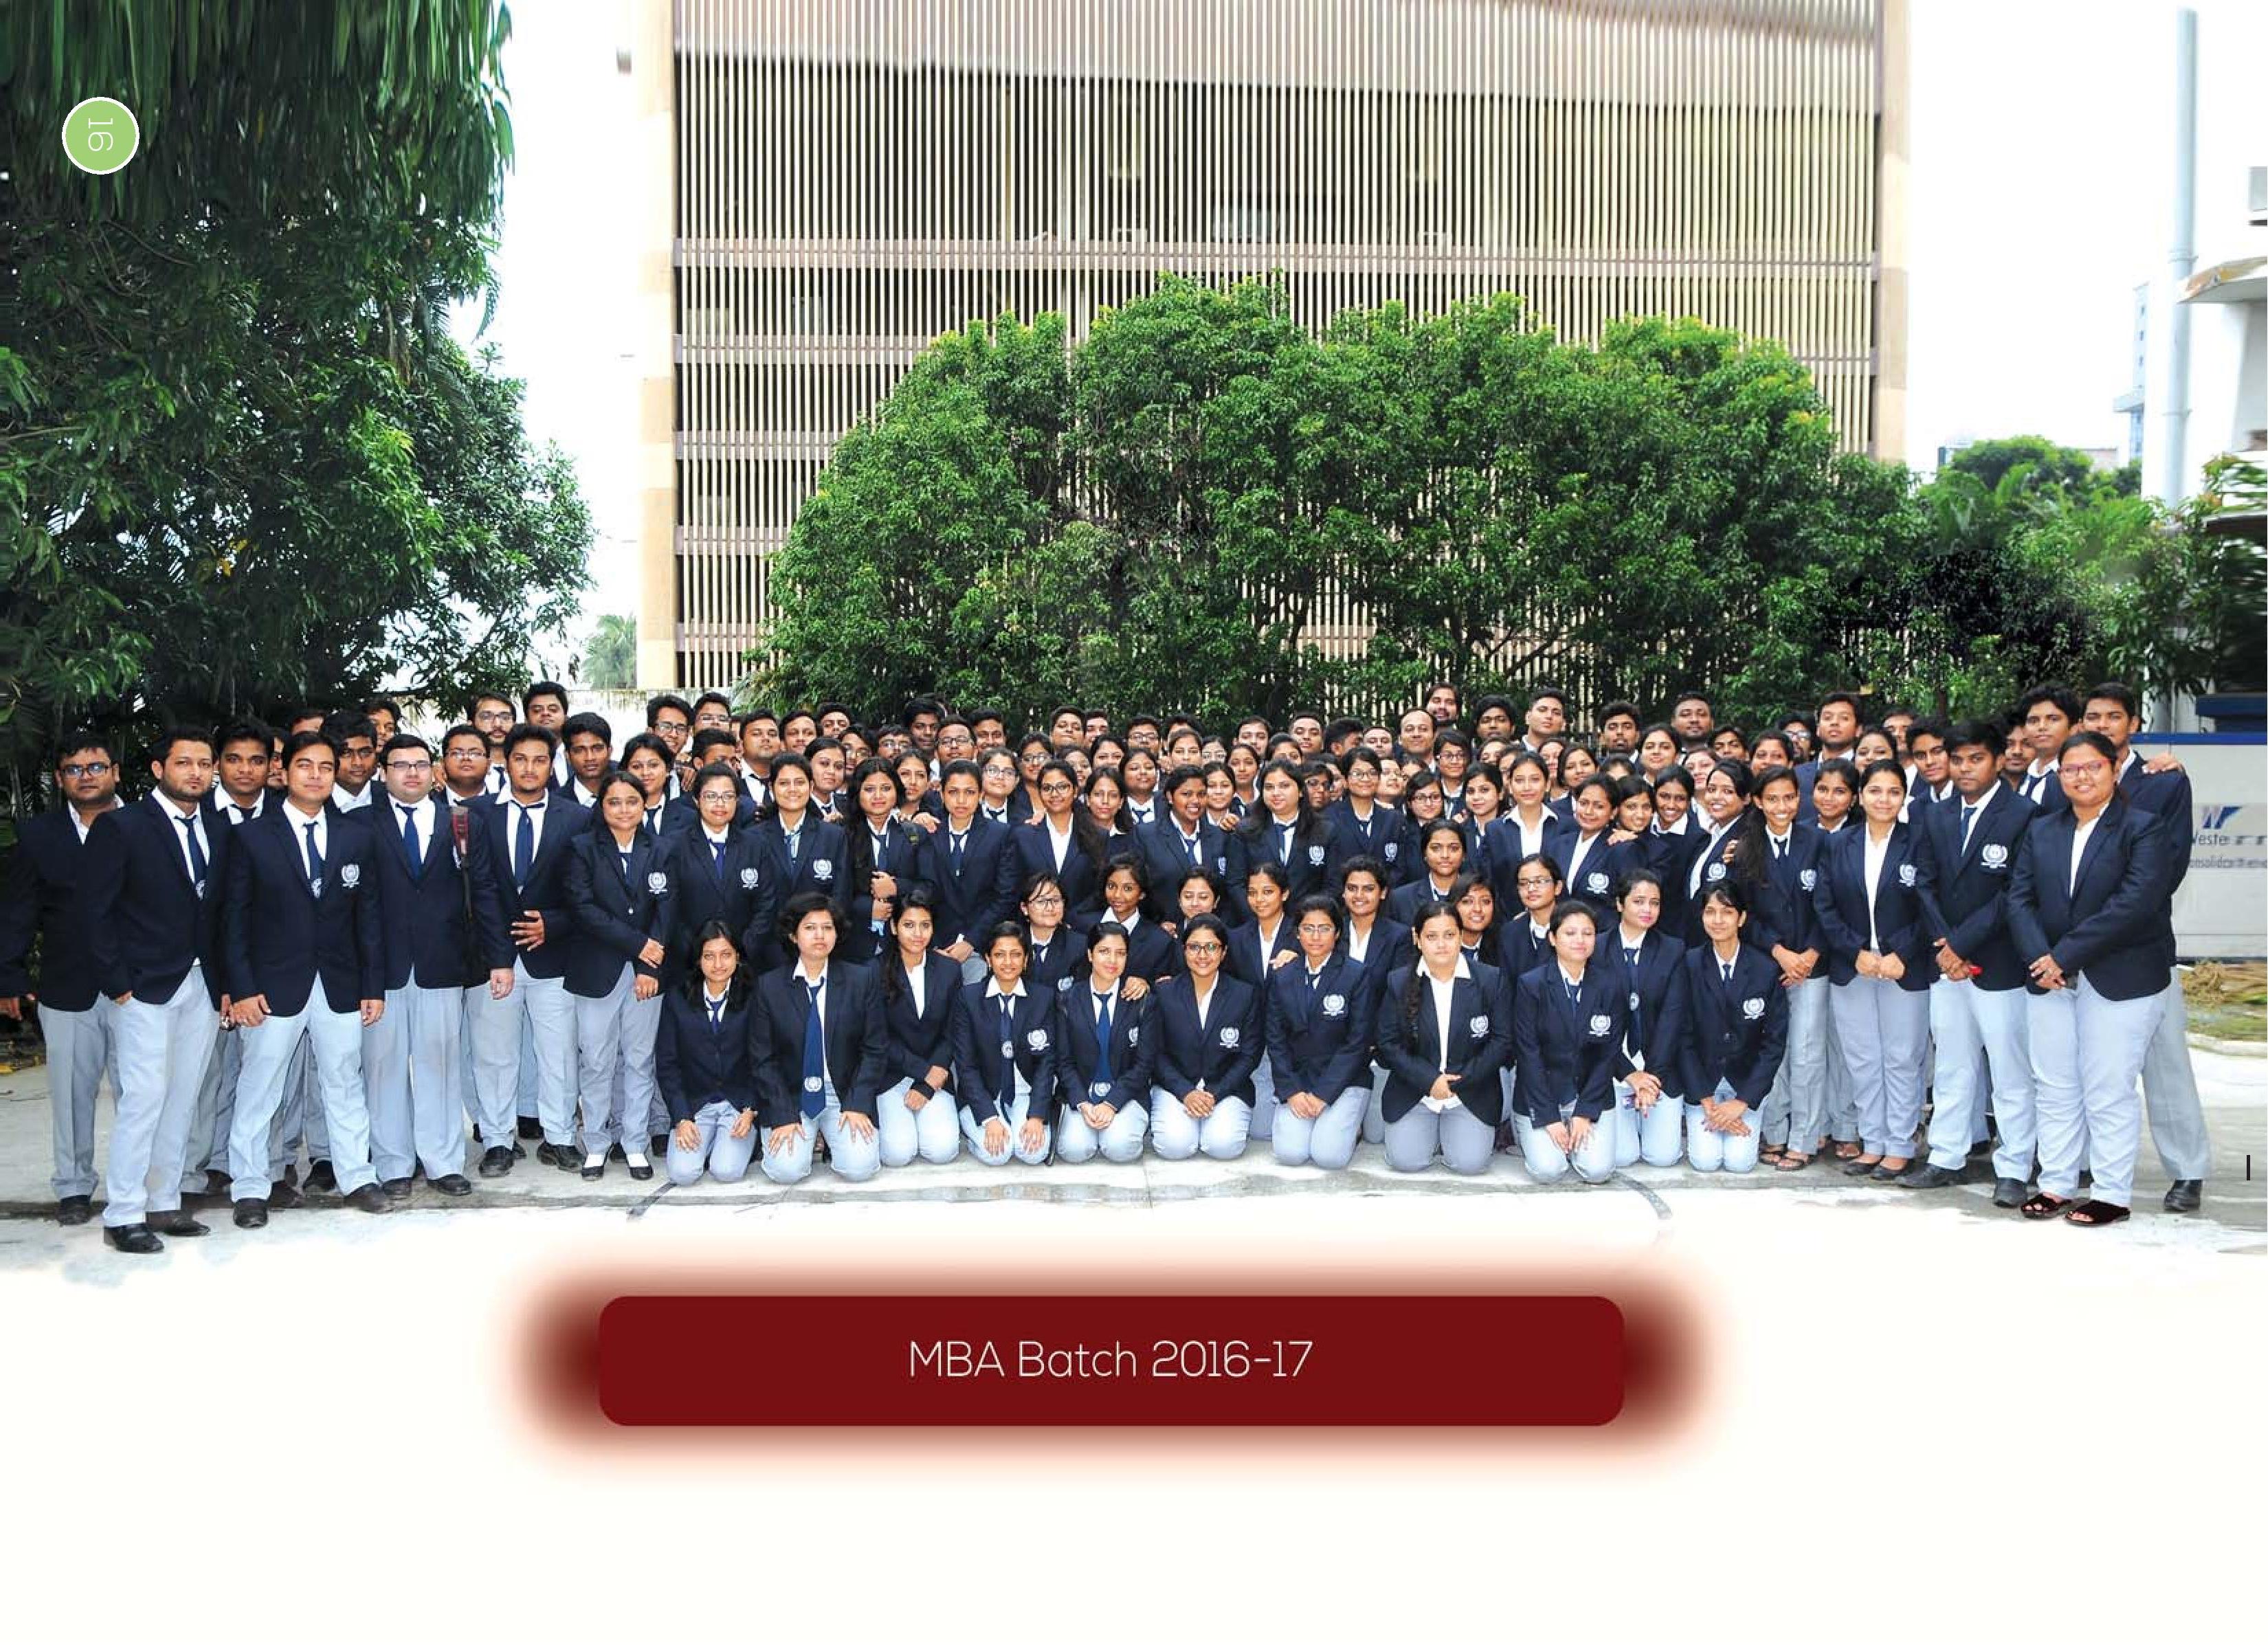 Current MBA batch